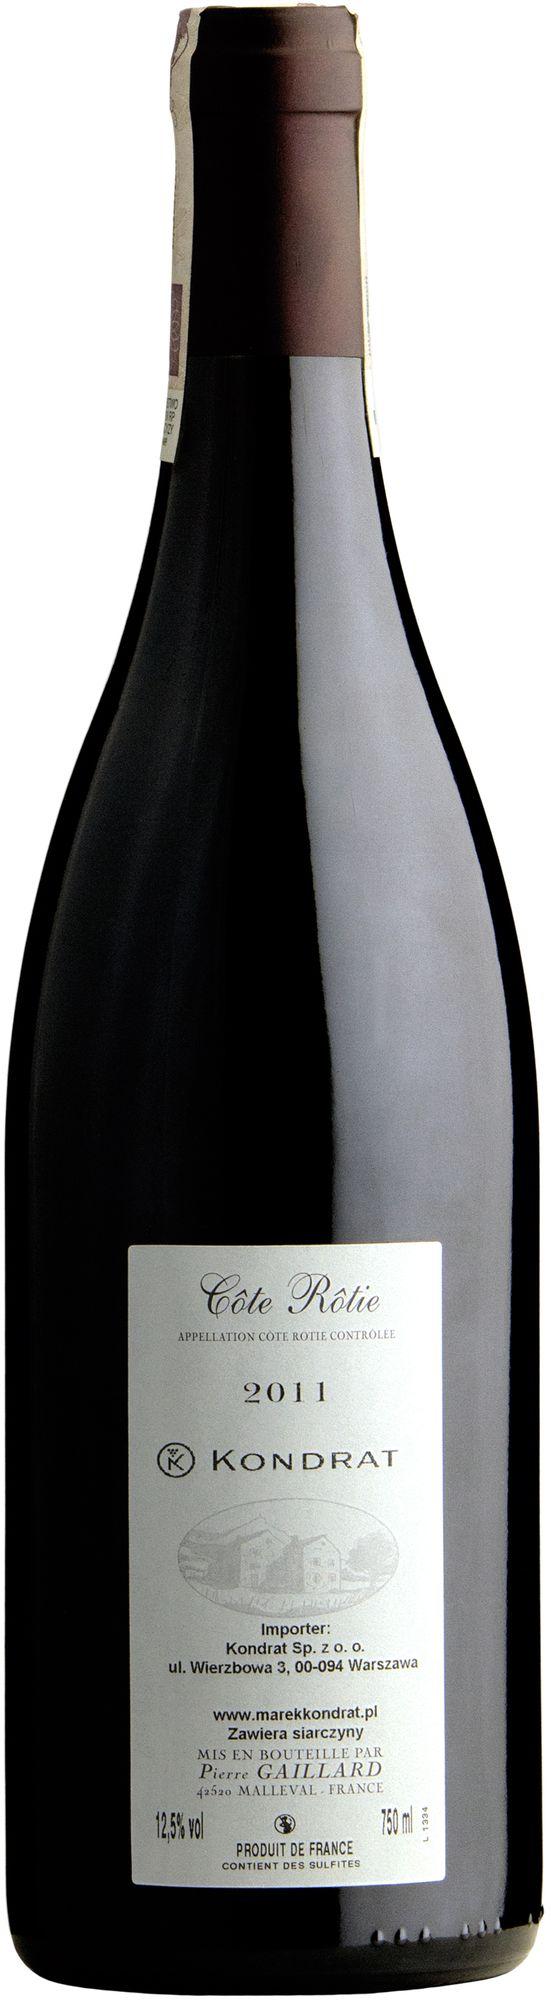 Wino Gaillard Cote Rotie AOC